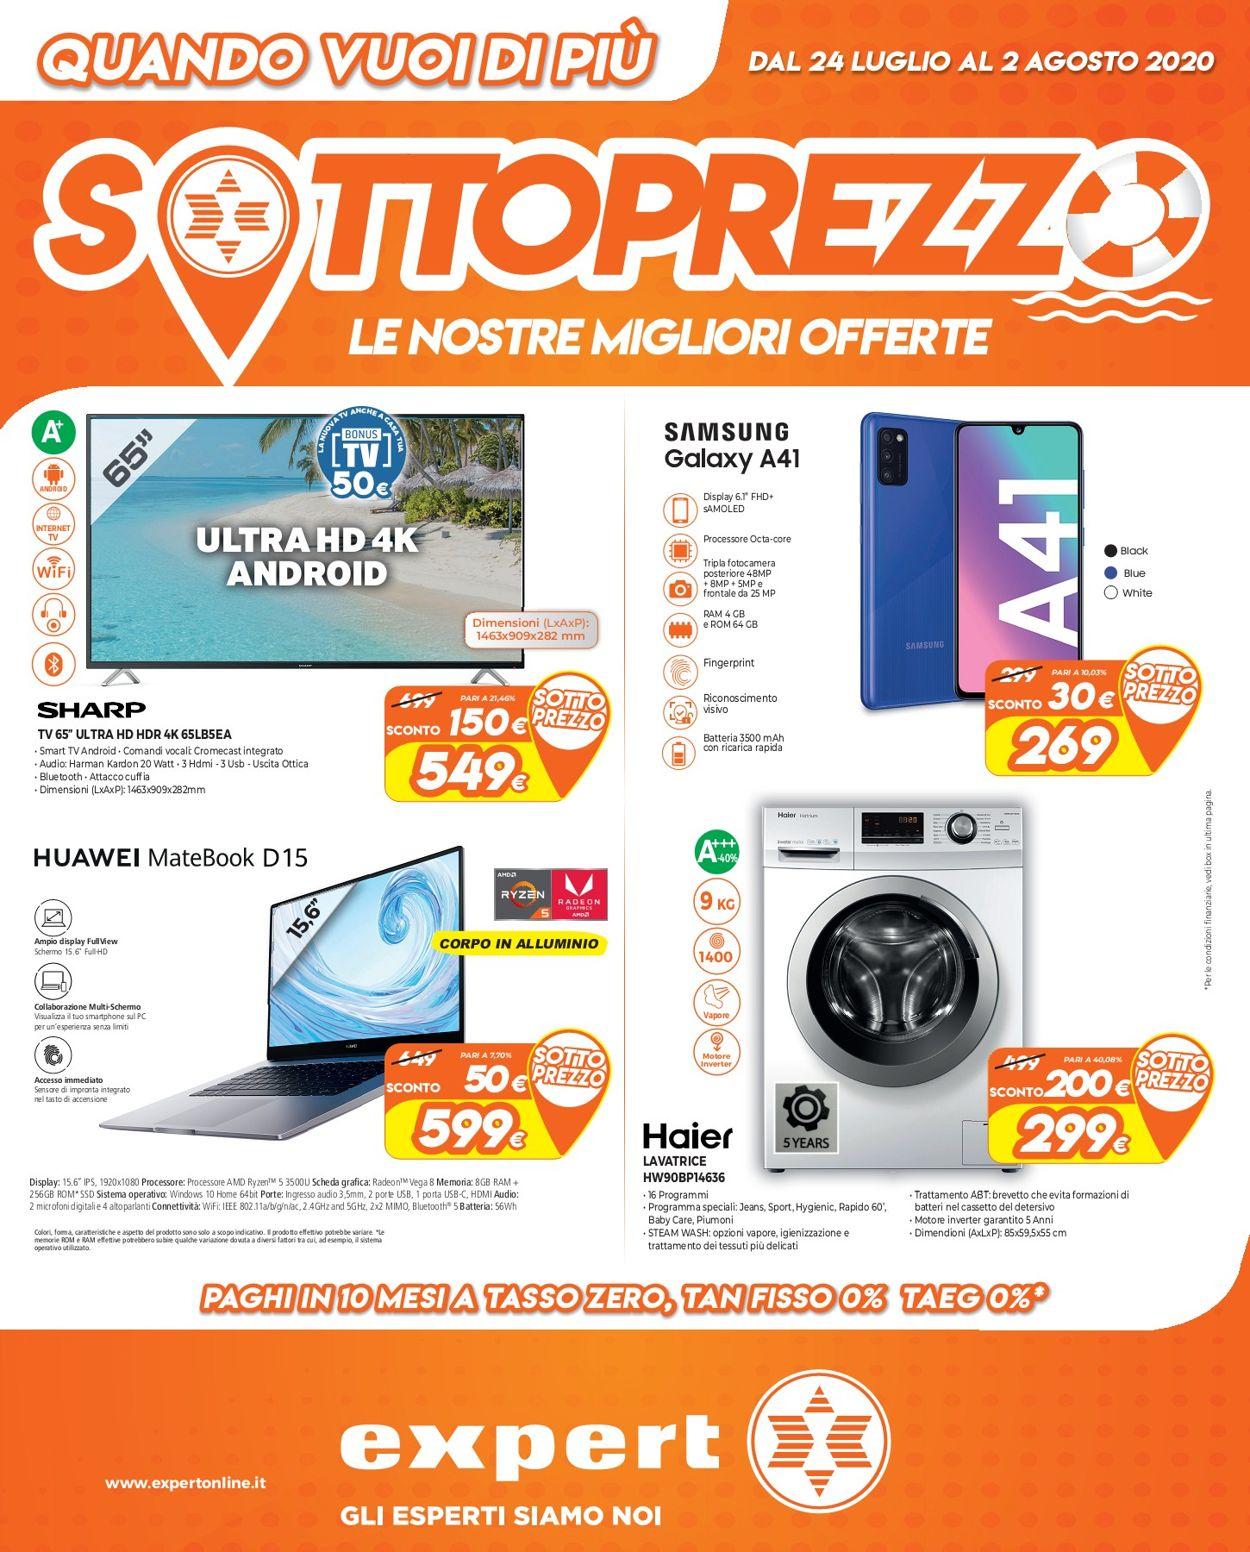 Volantino Iperal - Offerte 24/07-02/08/2020